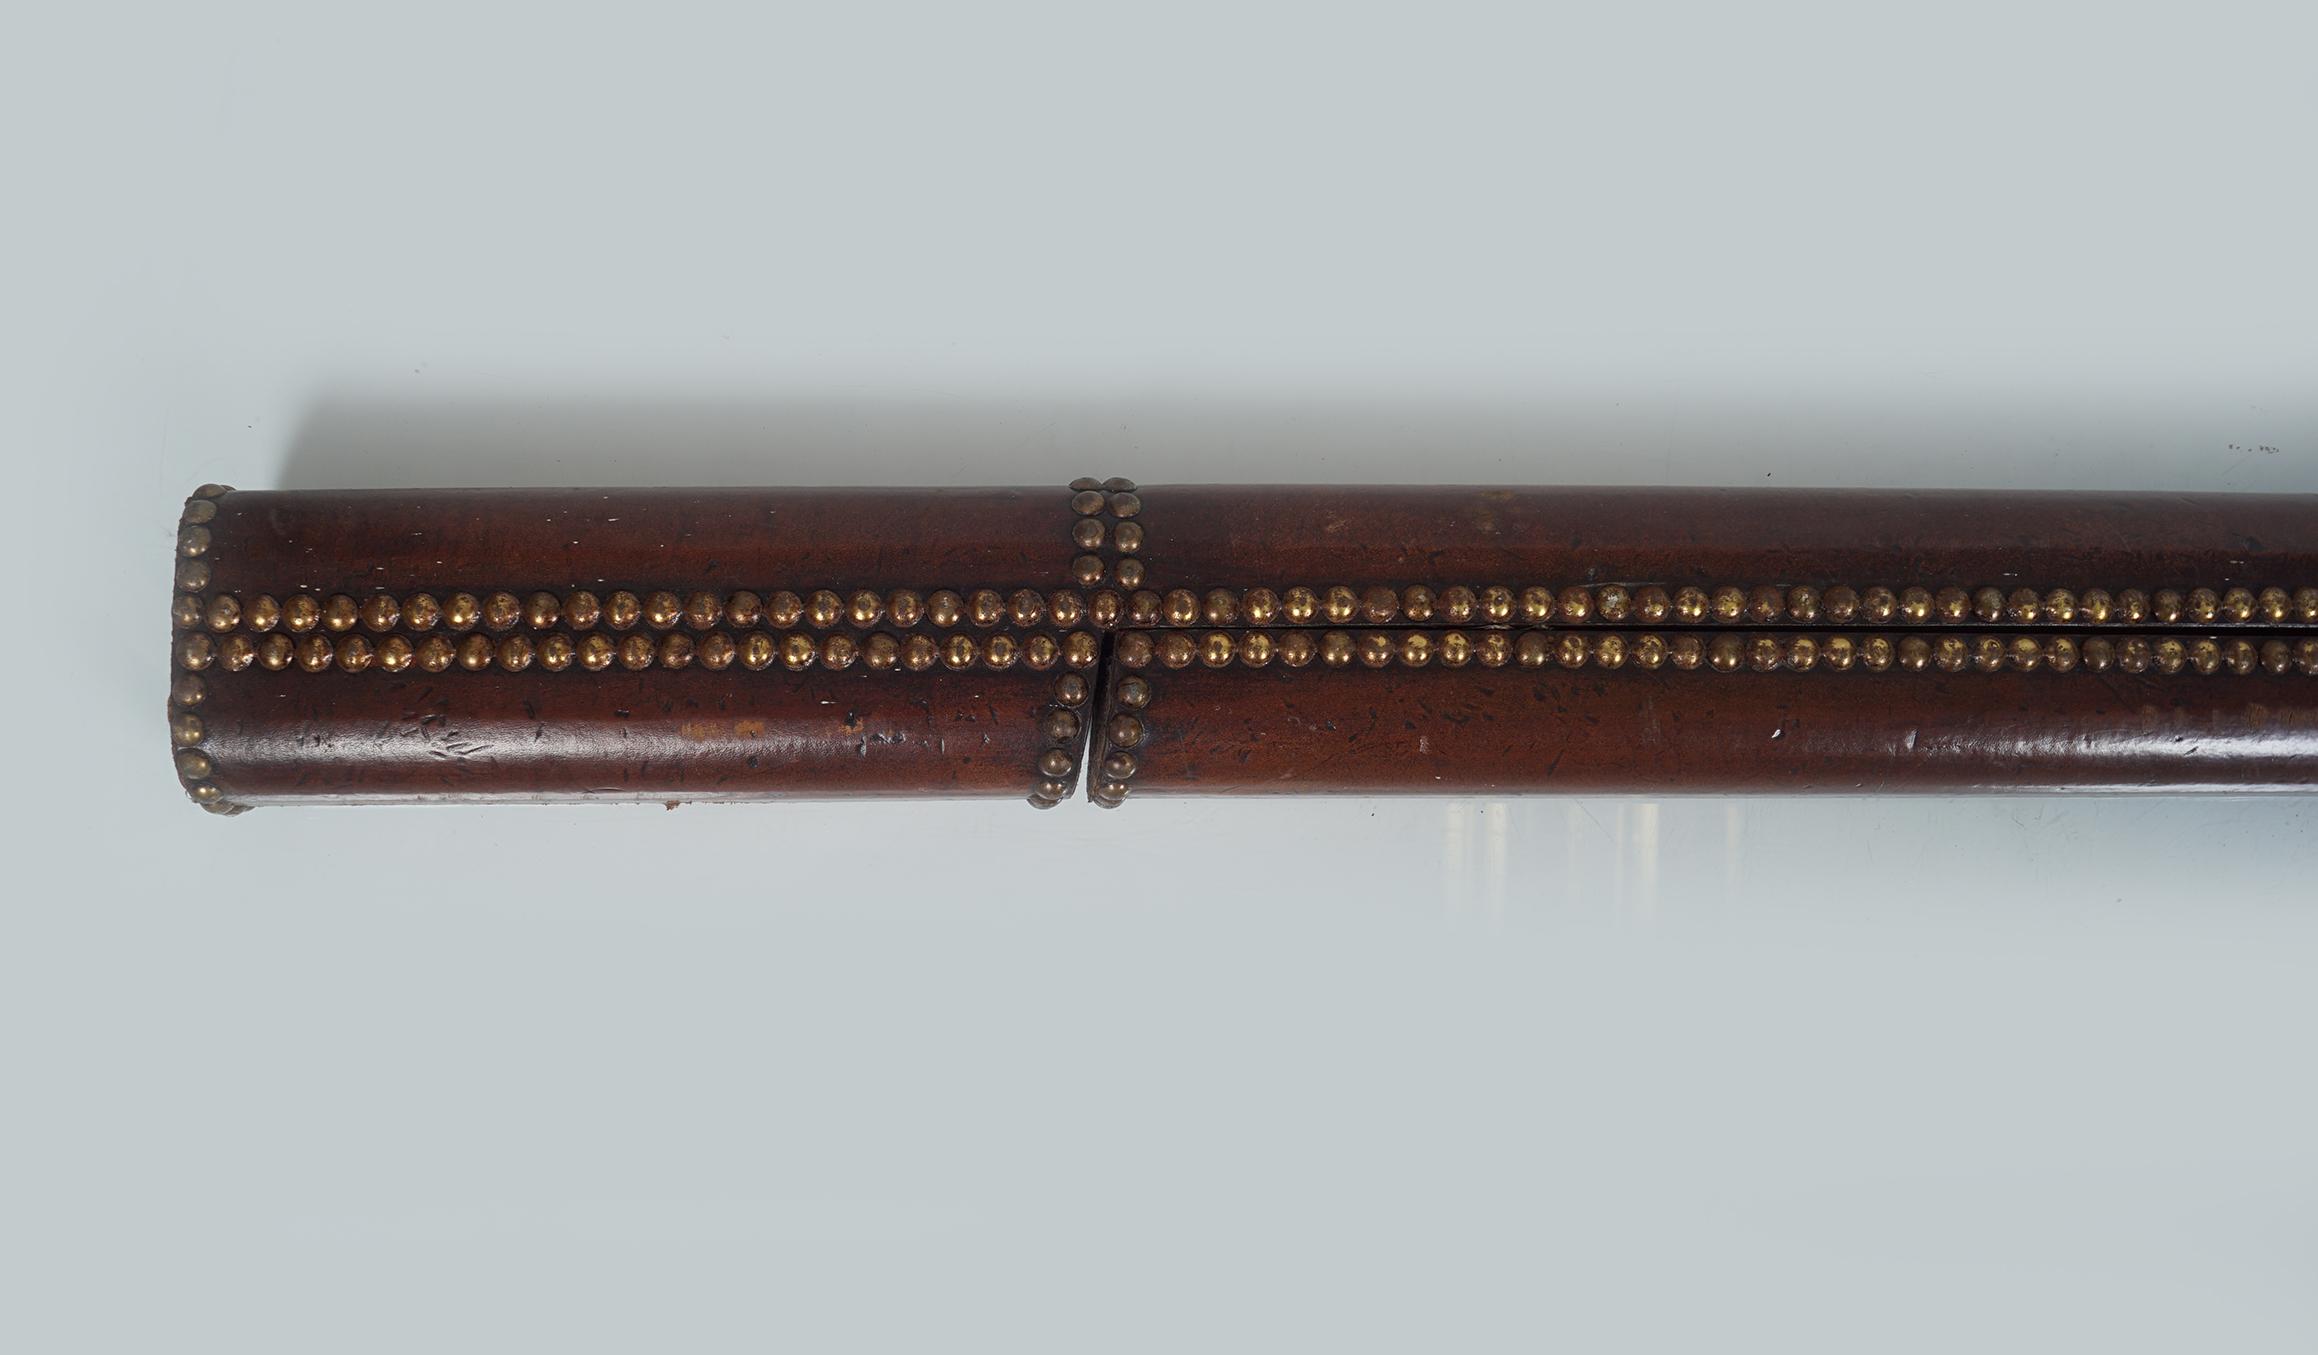 19TH-CENTURY METAMORPHIC LIBRARY POLE - Image 2 of 2